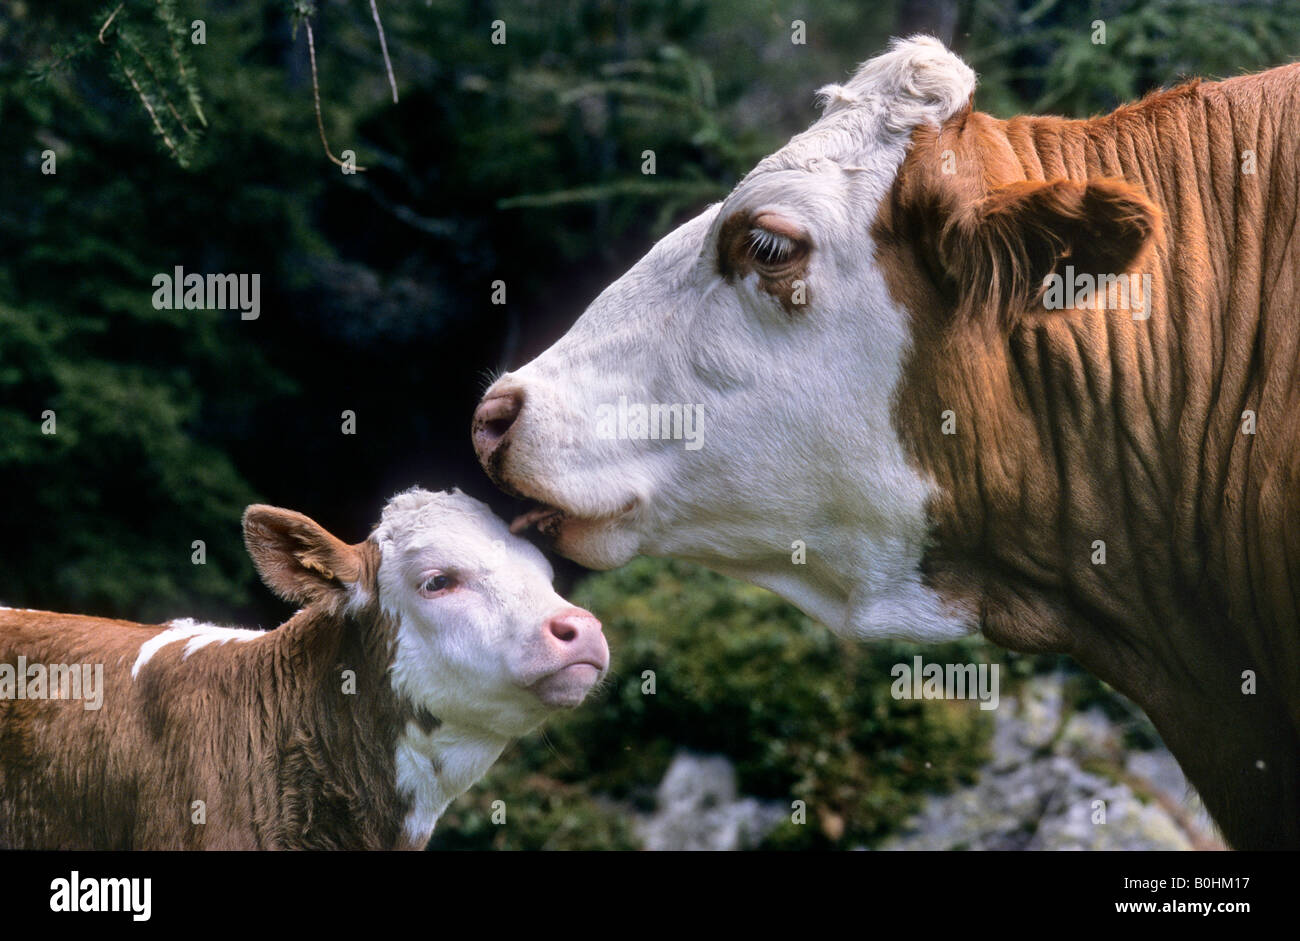 Cow licking her calf, Tyrol, Austria, Europe Stock Photo